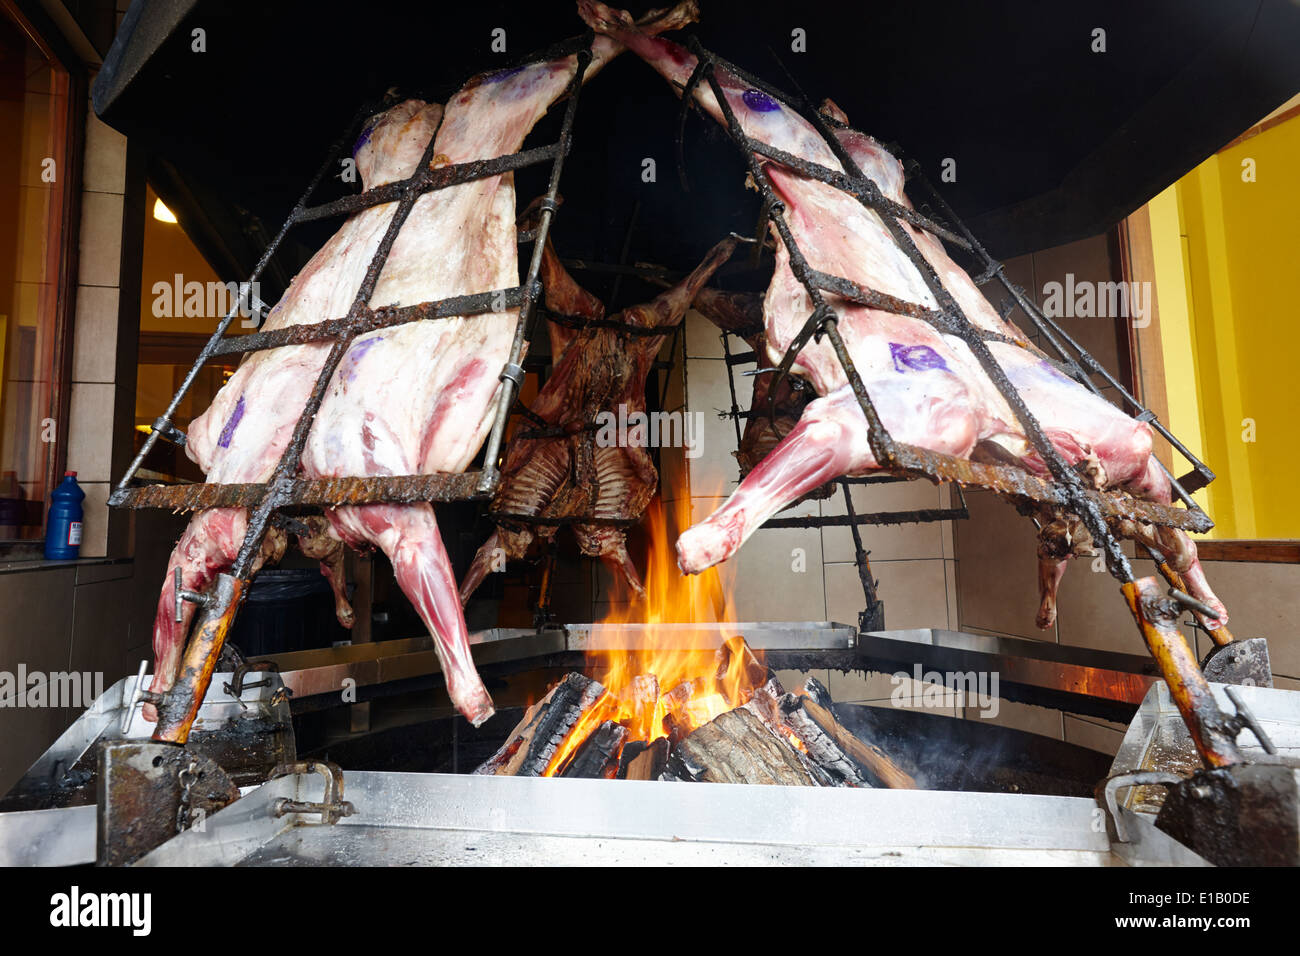 argentine asado whole lamb roasting over burning open fire in restaurant window Ushuaia Argentina - Stock Image